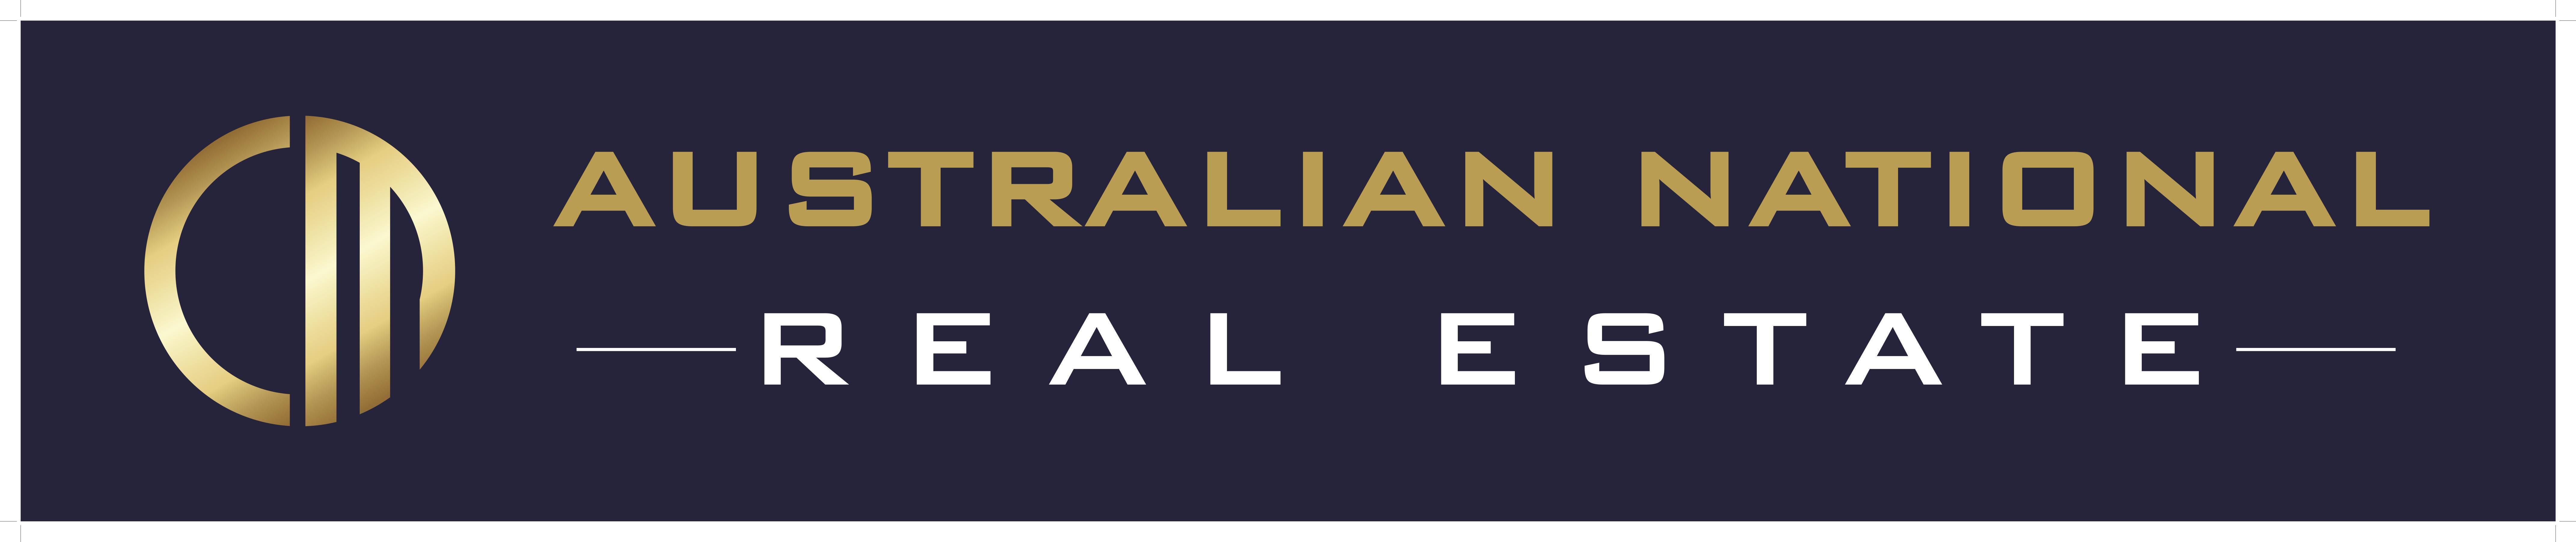 Australian National Real Estate, Hughesdale, 3166